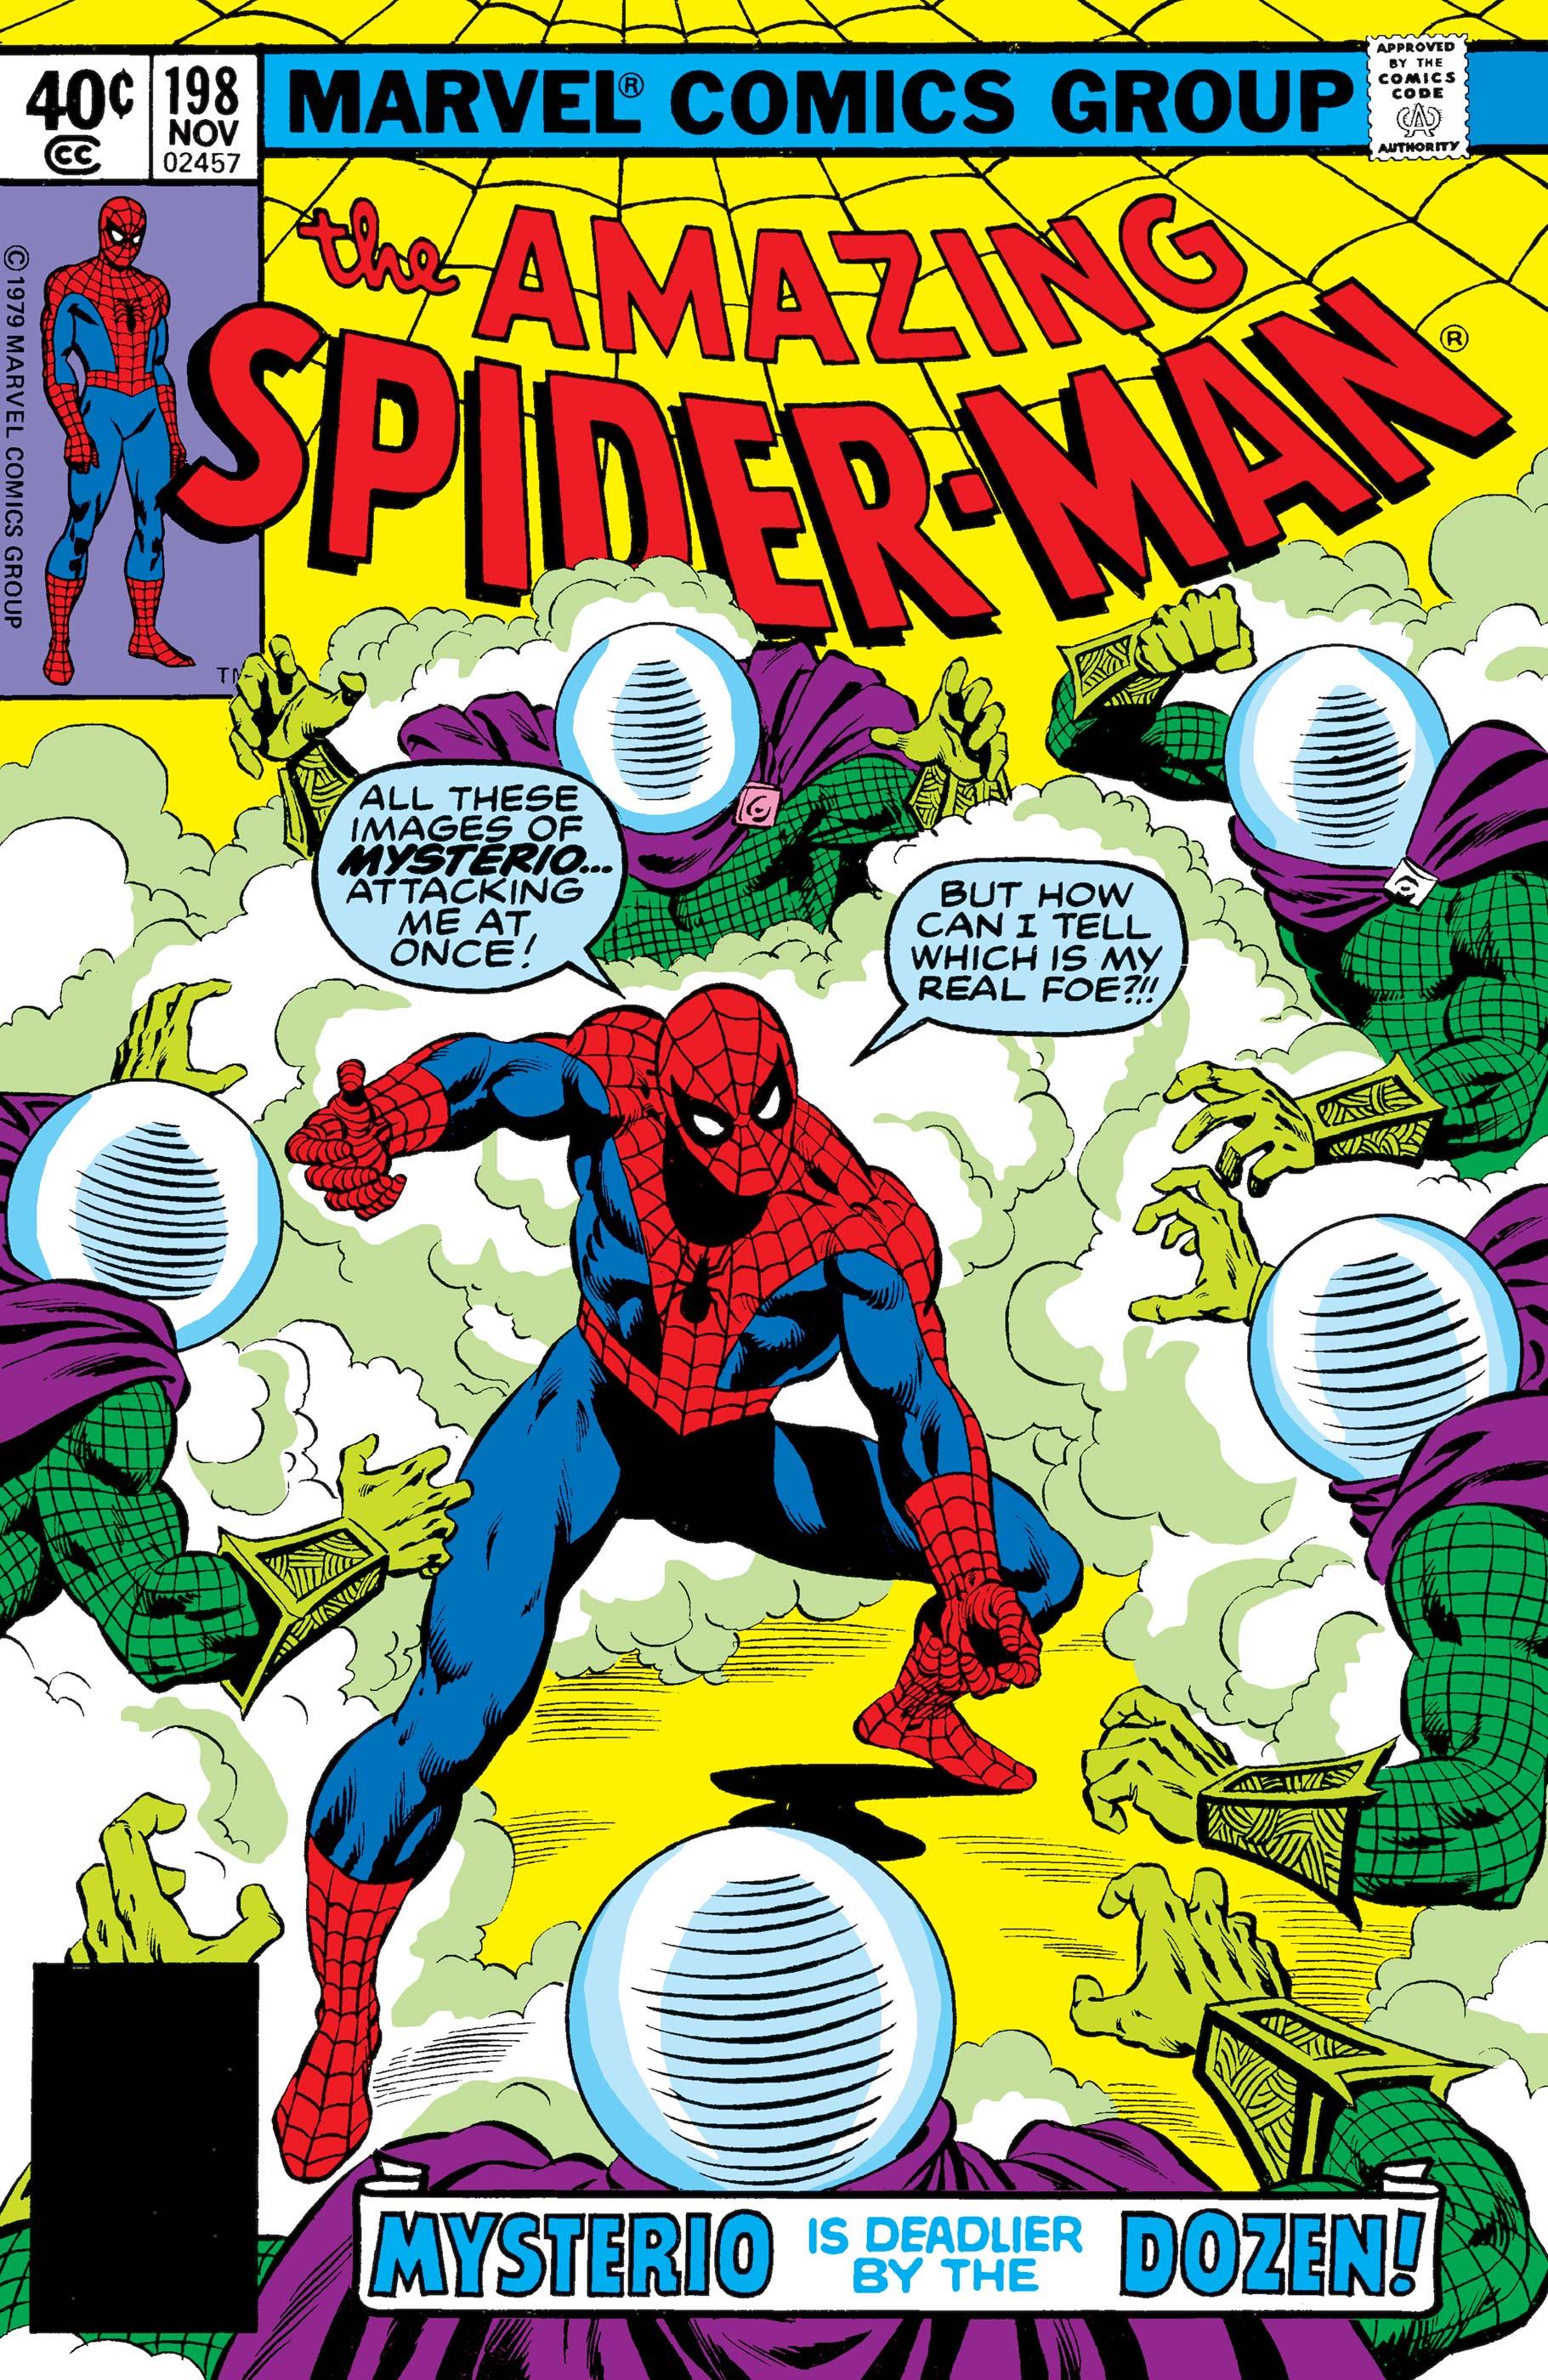 The Amazing Spider-Man (1963) #198